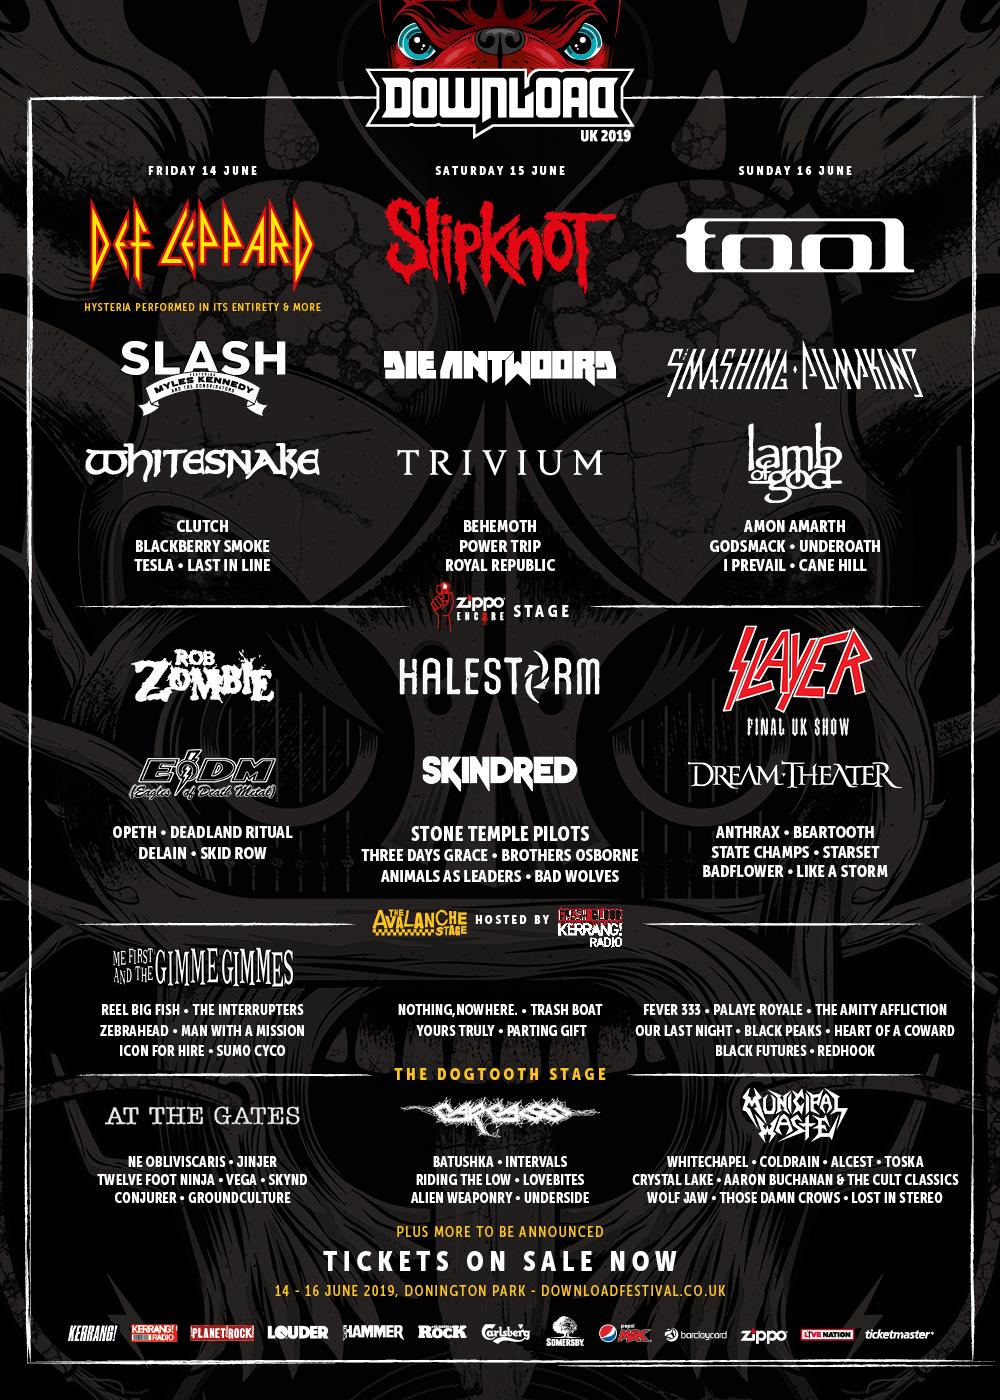 Download Festival 2019 ones to watch part 1 - ALTCORNER com